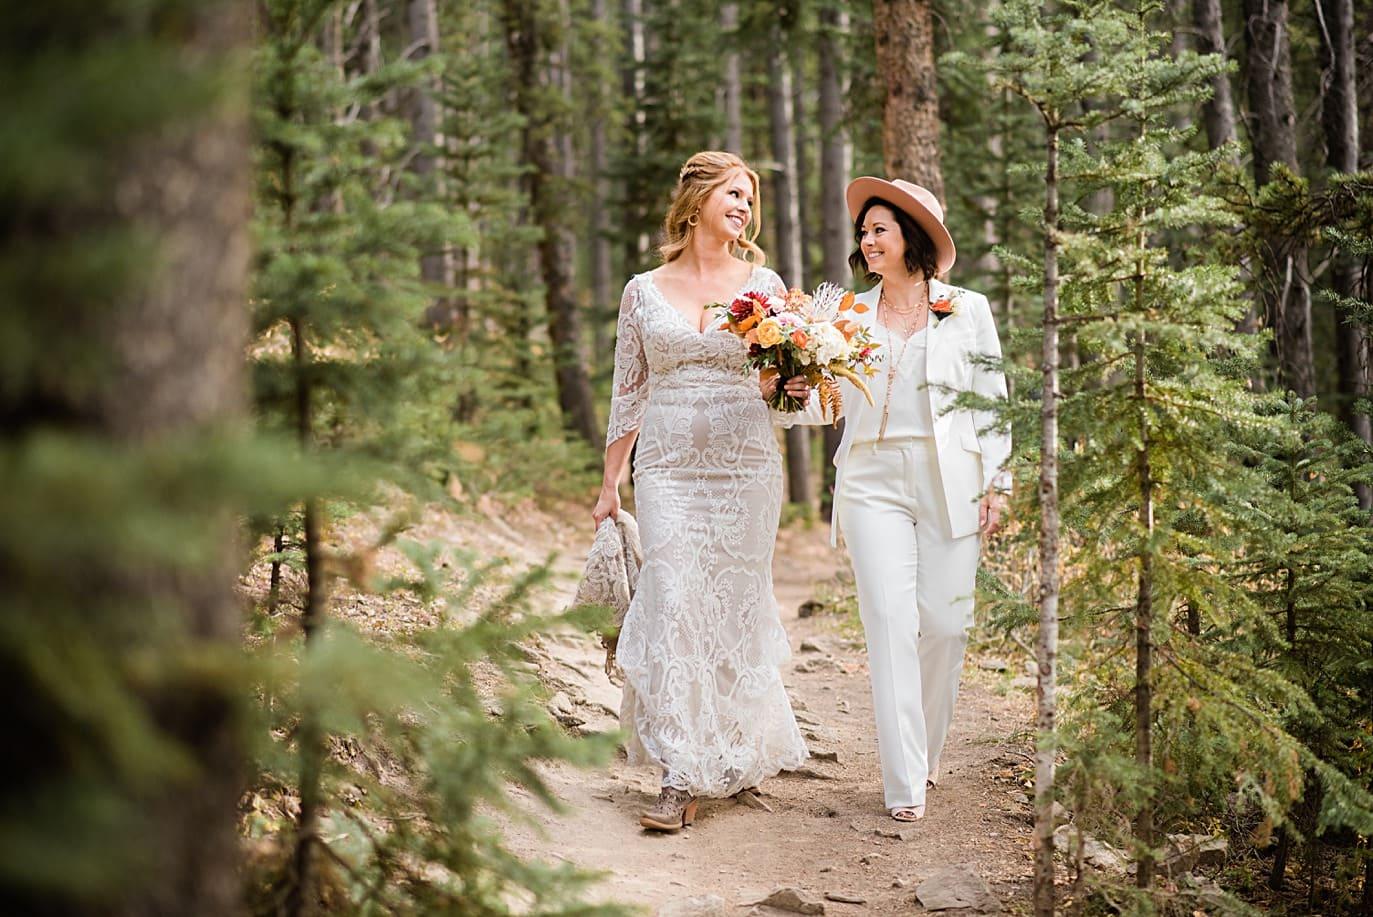 two brides walk through woods at Breckenridge microwedding by Colorado LGBT wedding photographer Jennie Crate